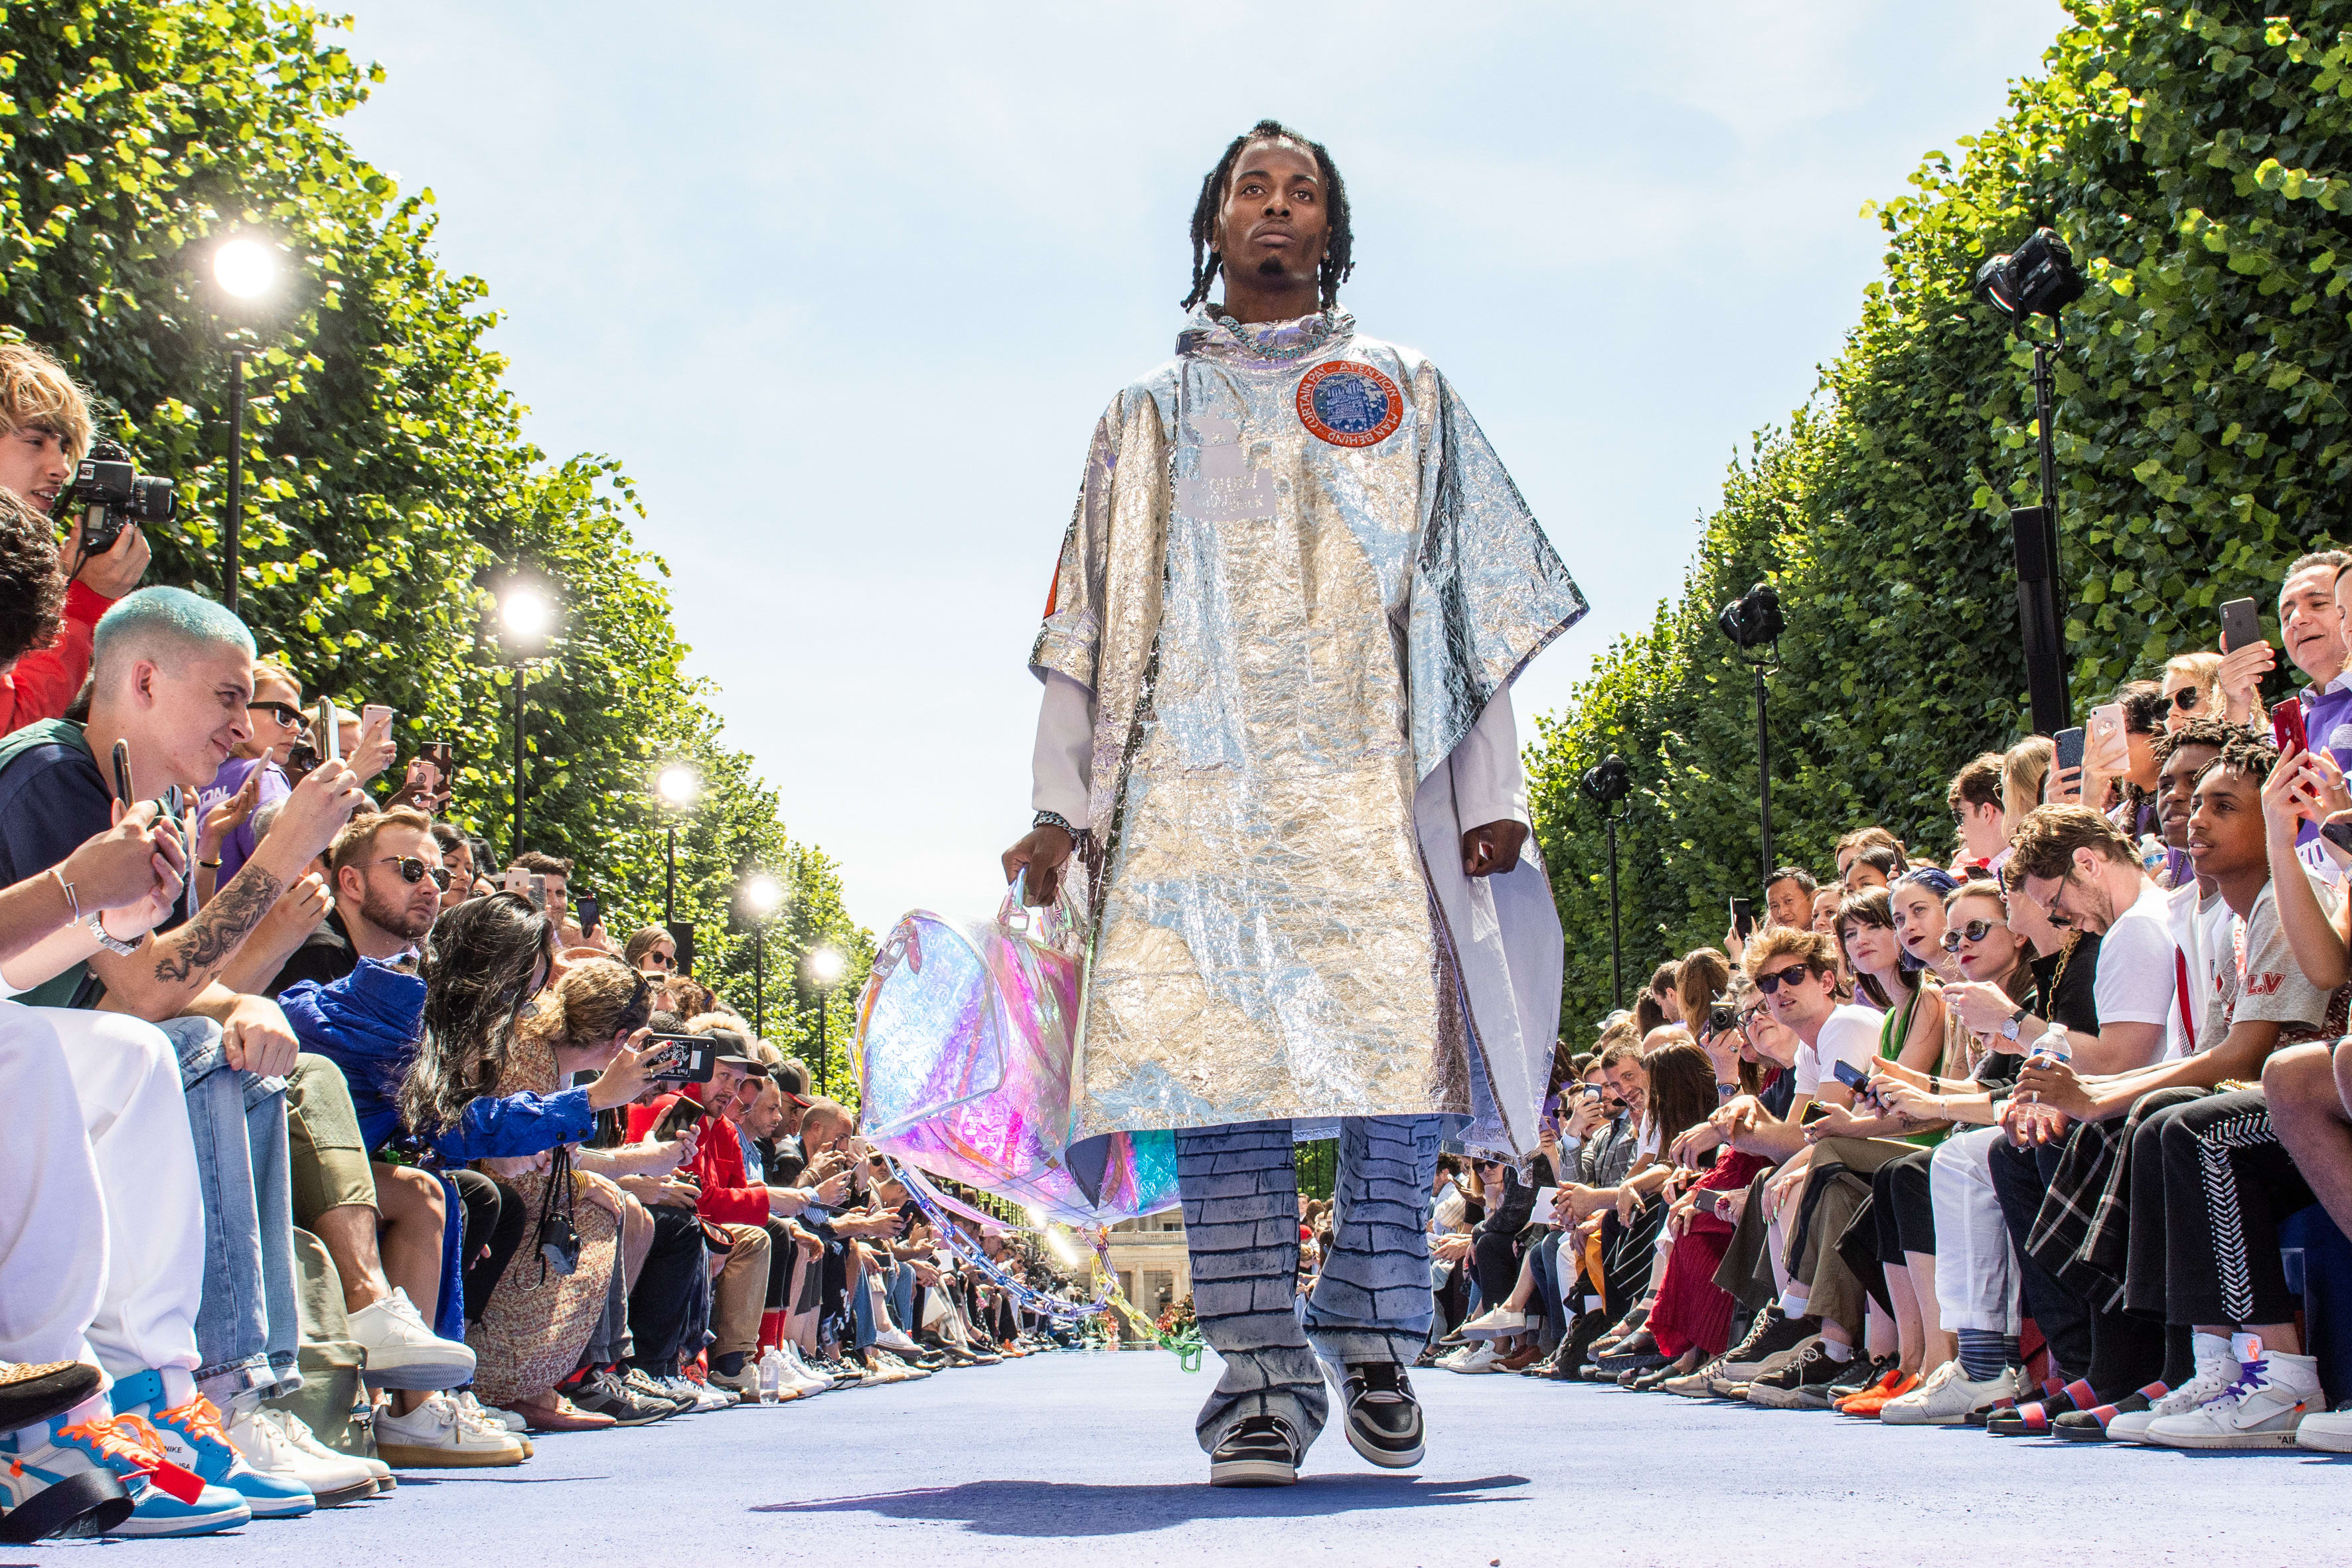 Playboi Carti Walking the Louis Vuitton Runway for Spring/Summer 2019